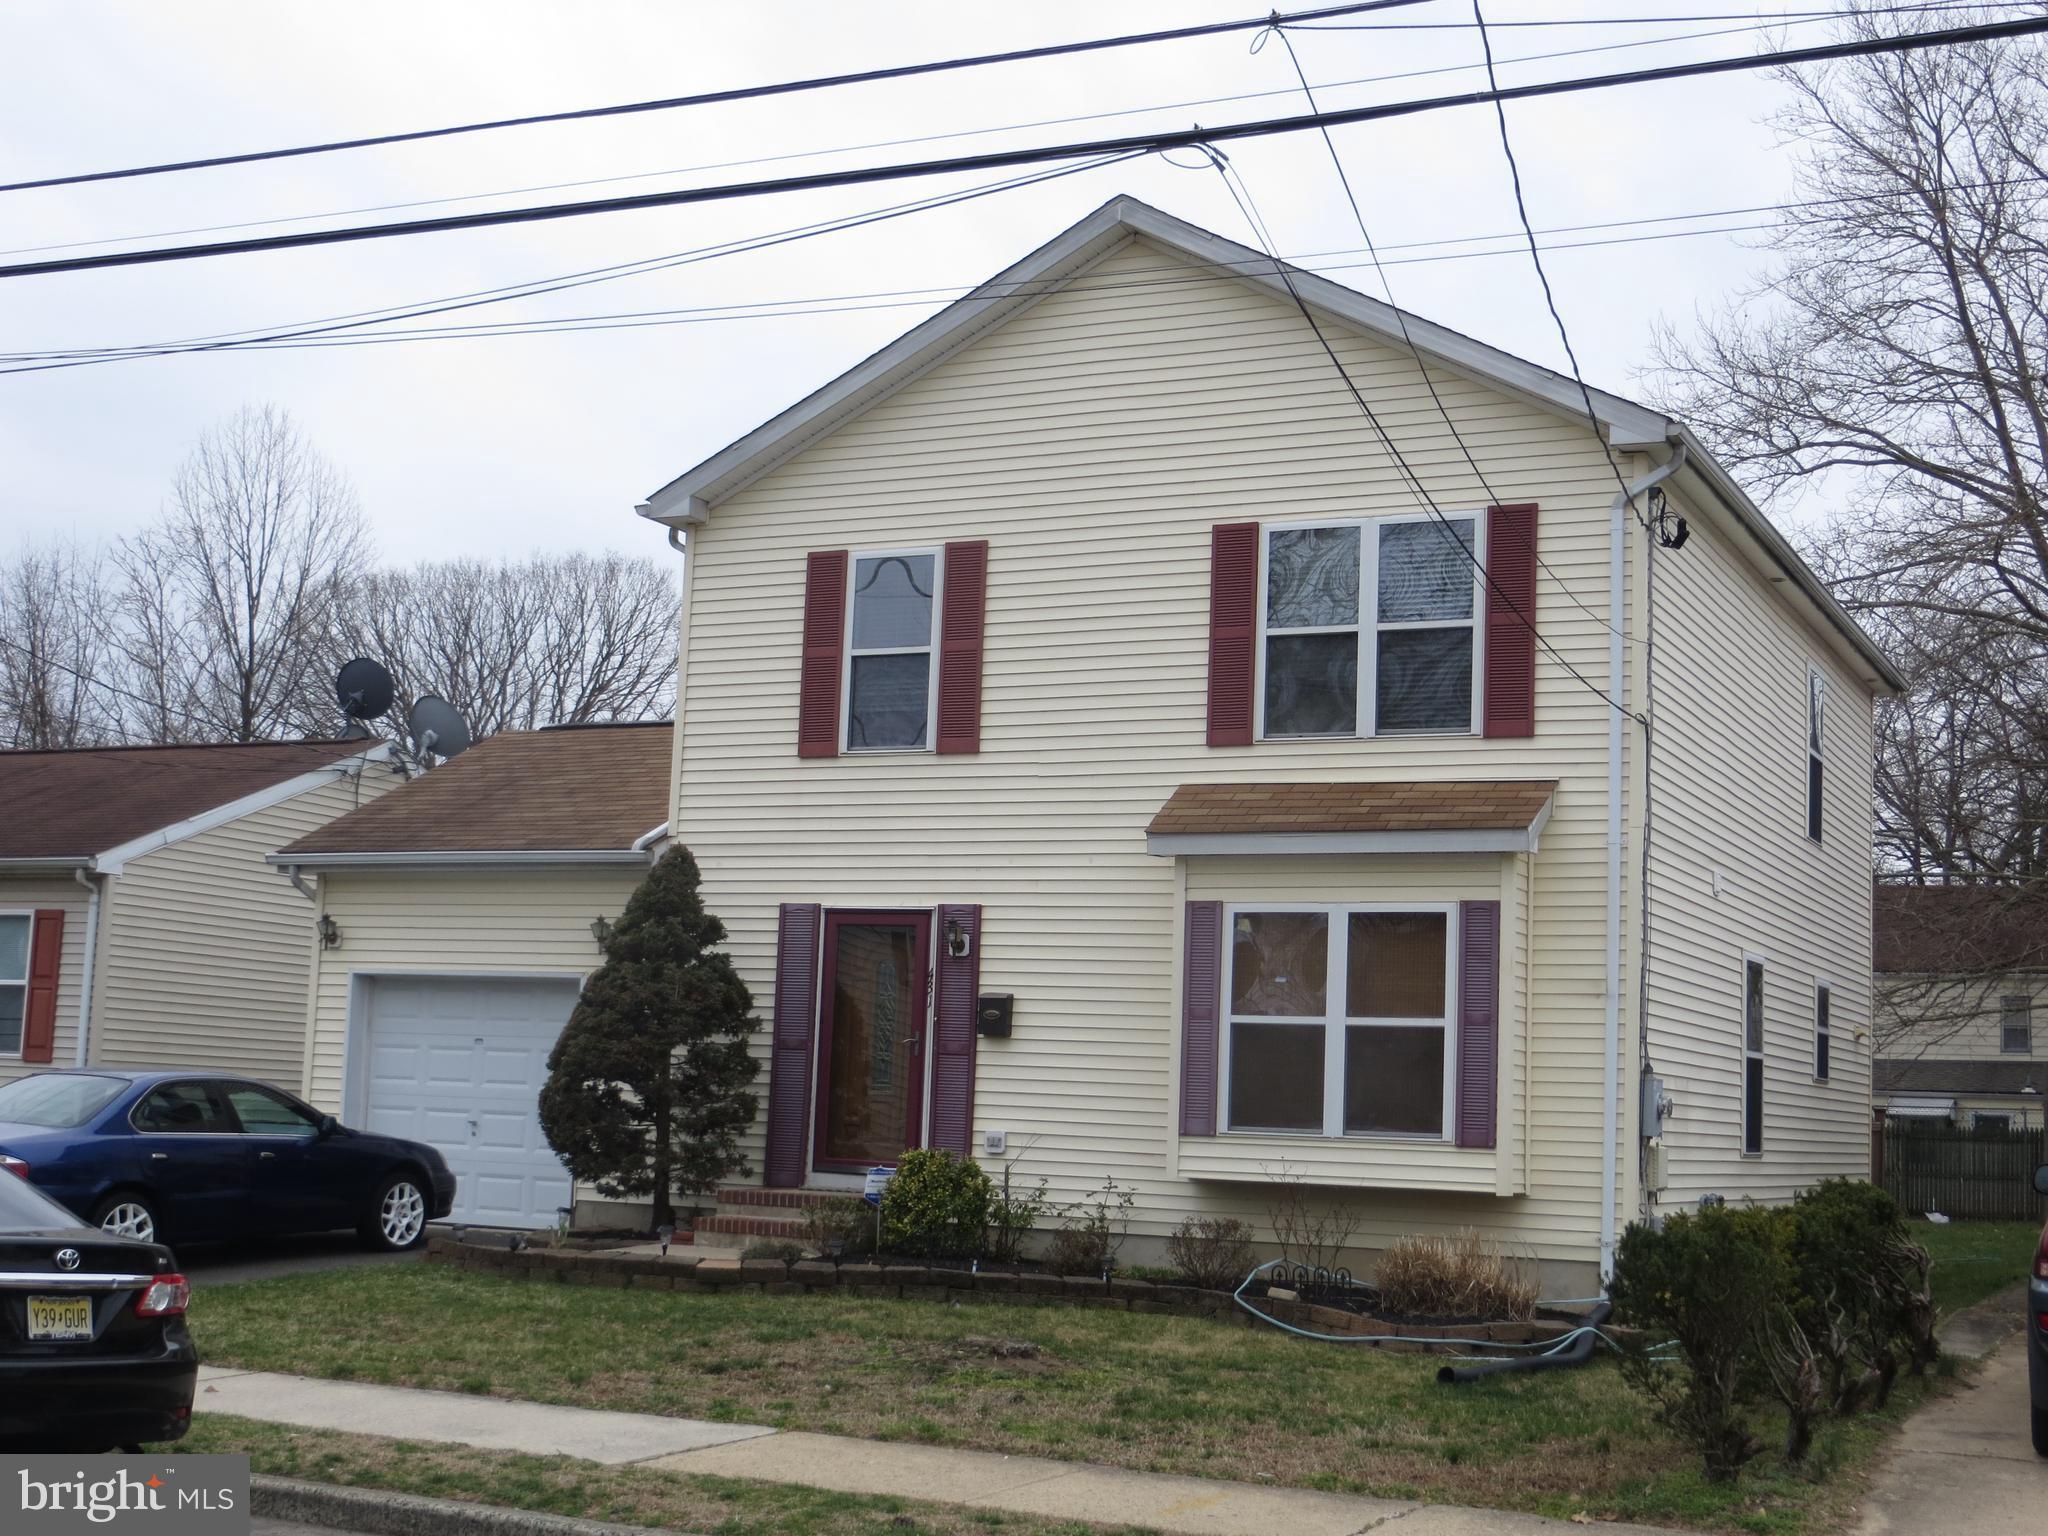 431 CONNECTICUT AVENUE, HAMILTON, NJ 08629